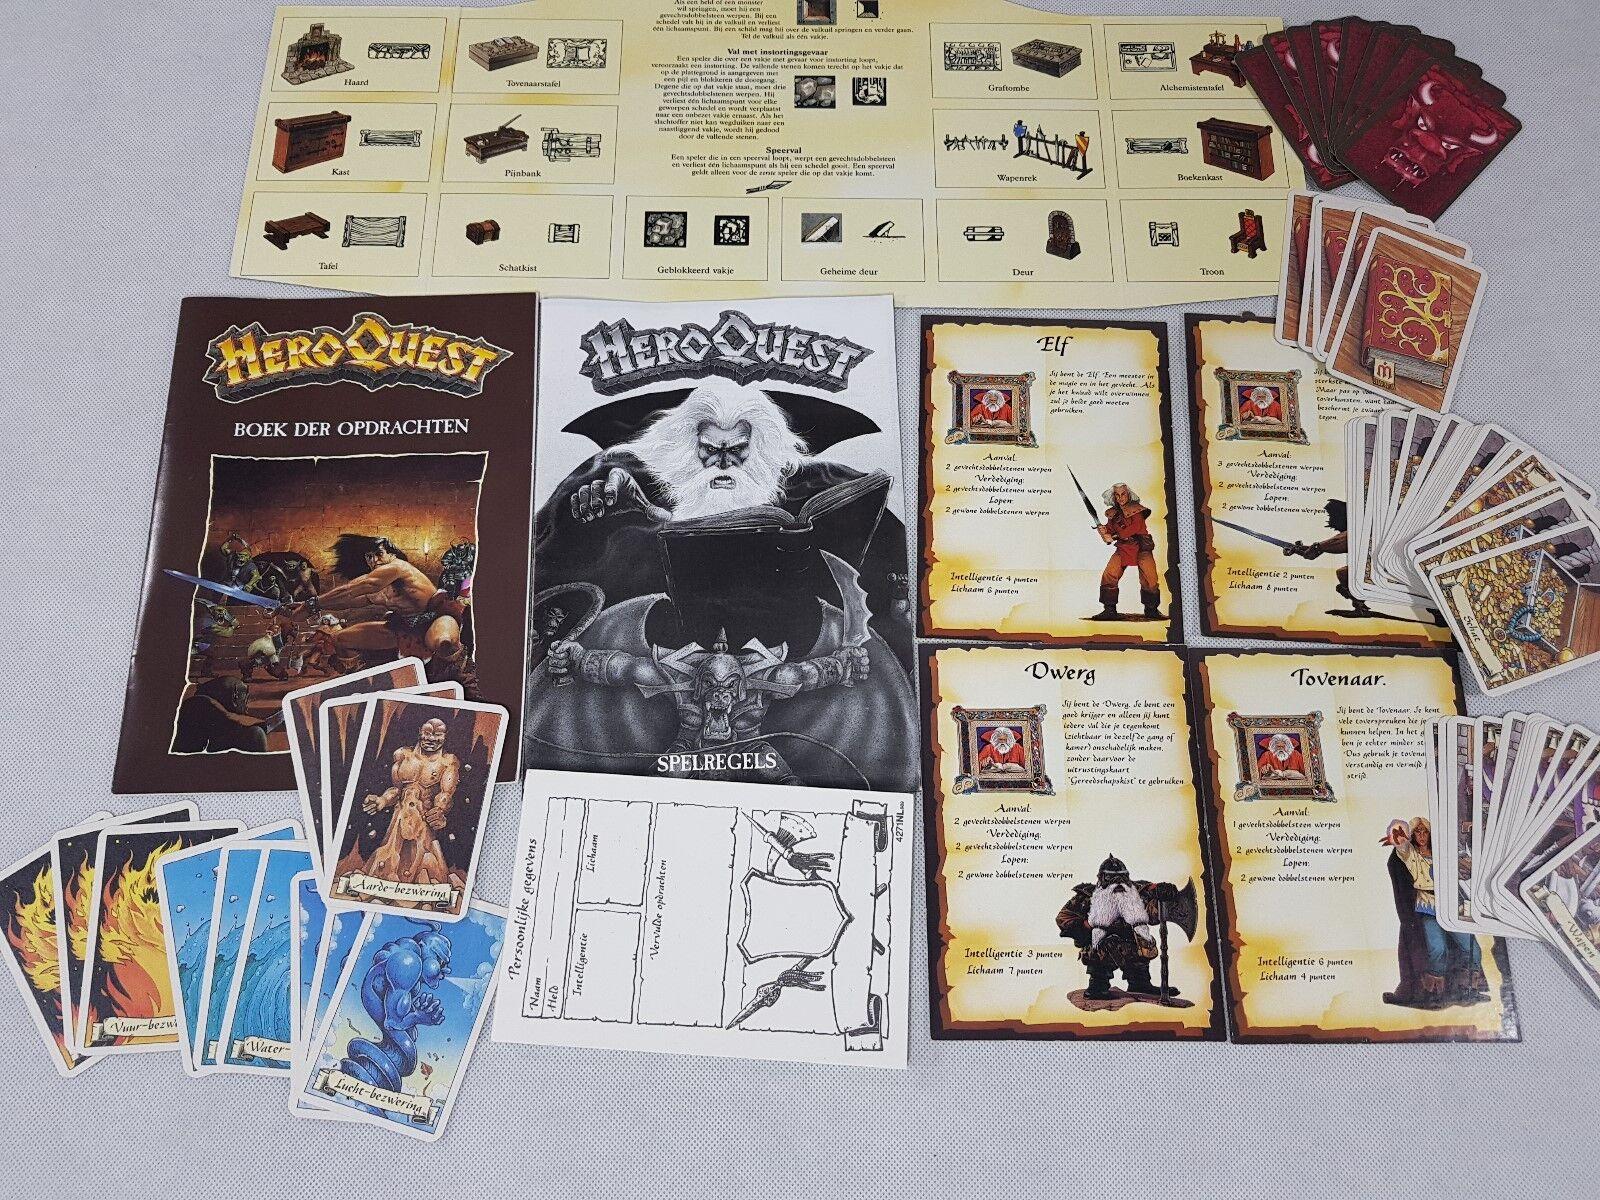 HeroQuest Language Pack - Dutch Hero Quest [1989]